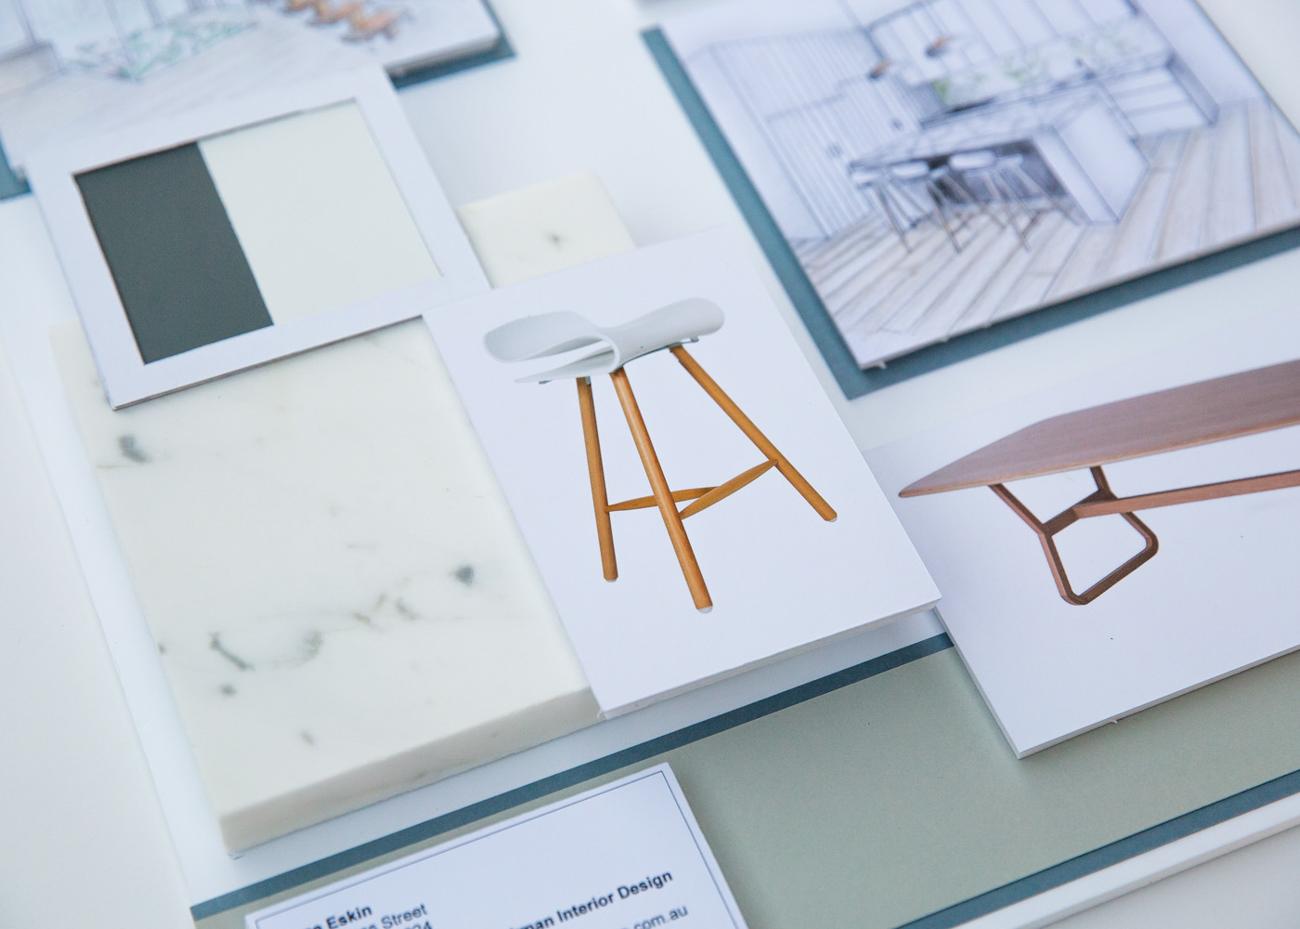 study design sydney produce to order